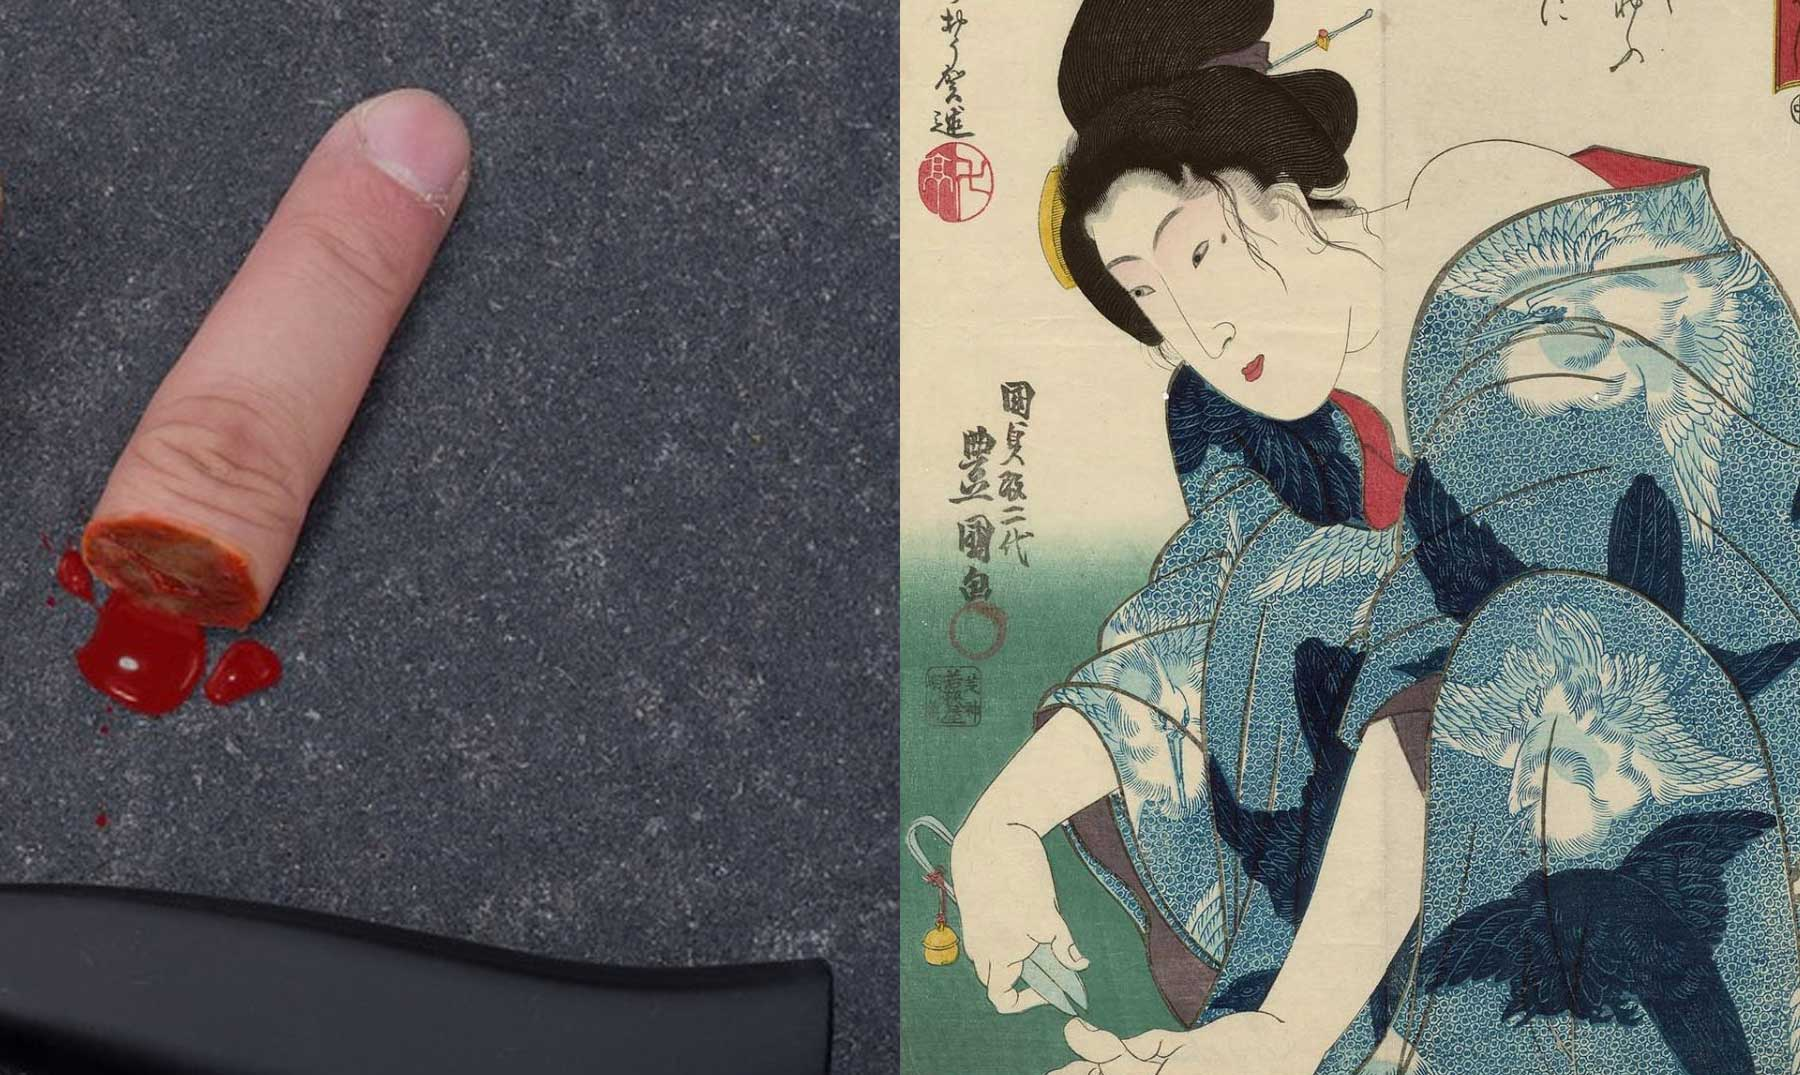 Dedos Como Prueba De Amor Las Cortesanas Japonesas En La Era Edo